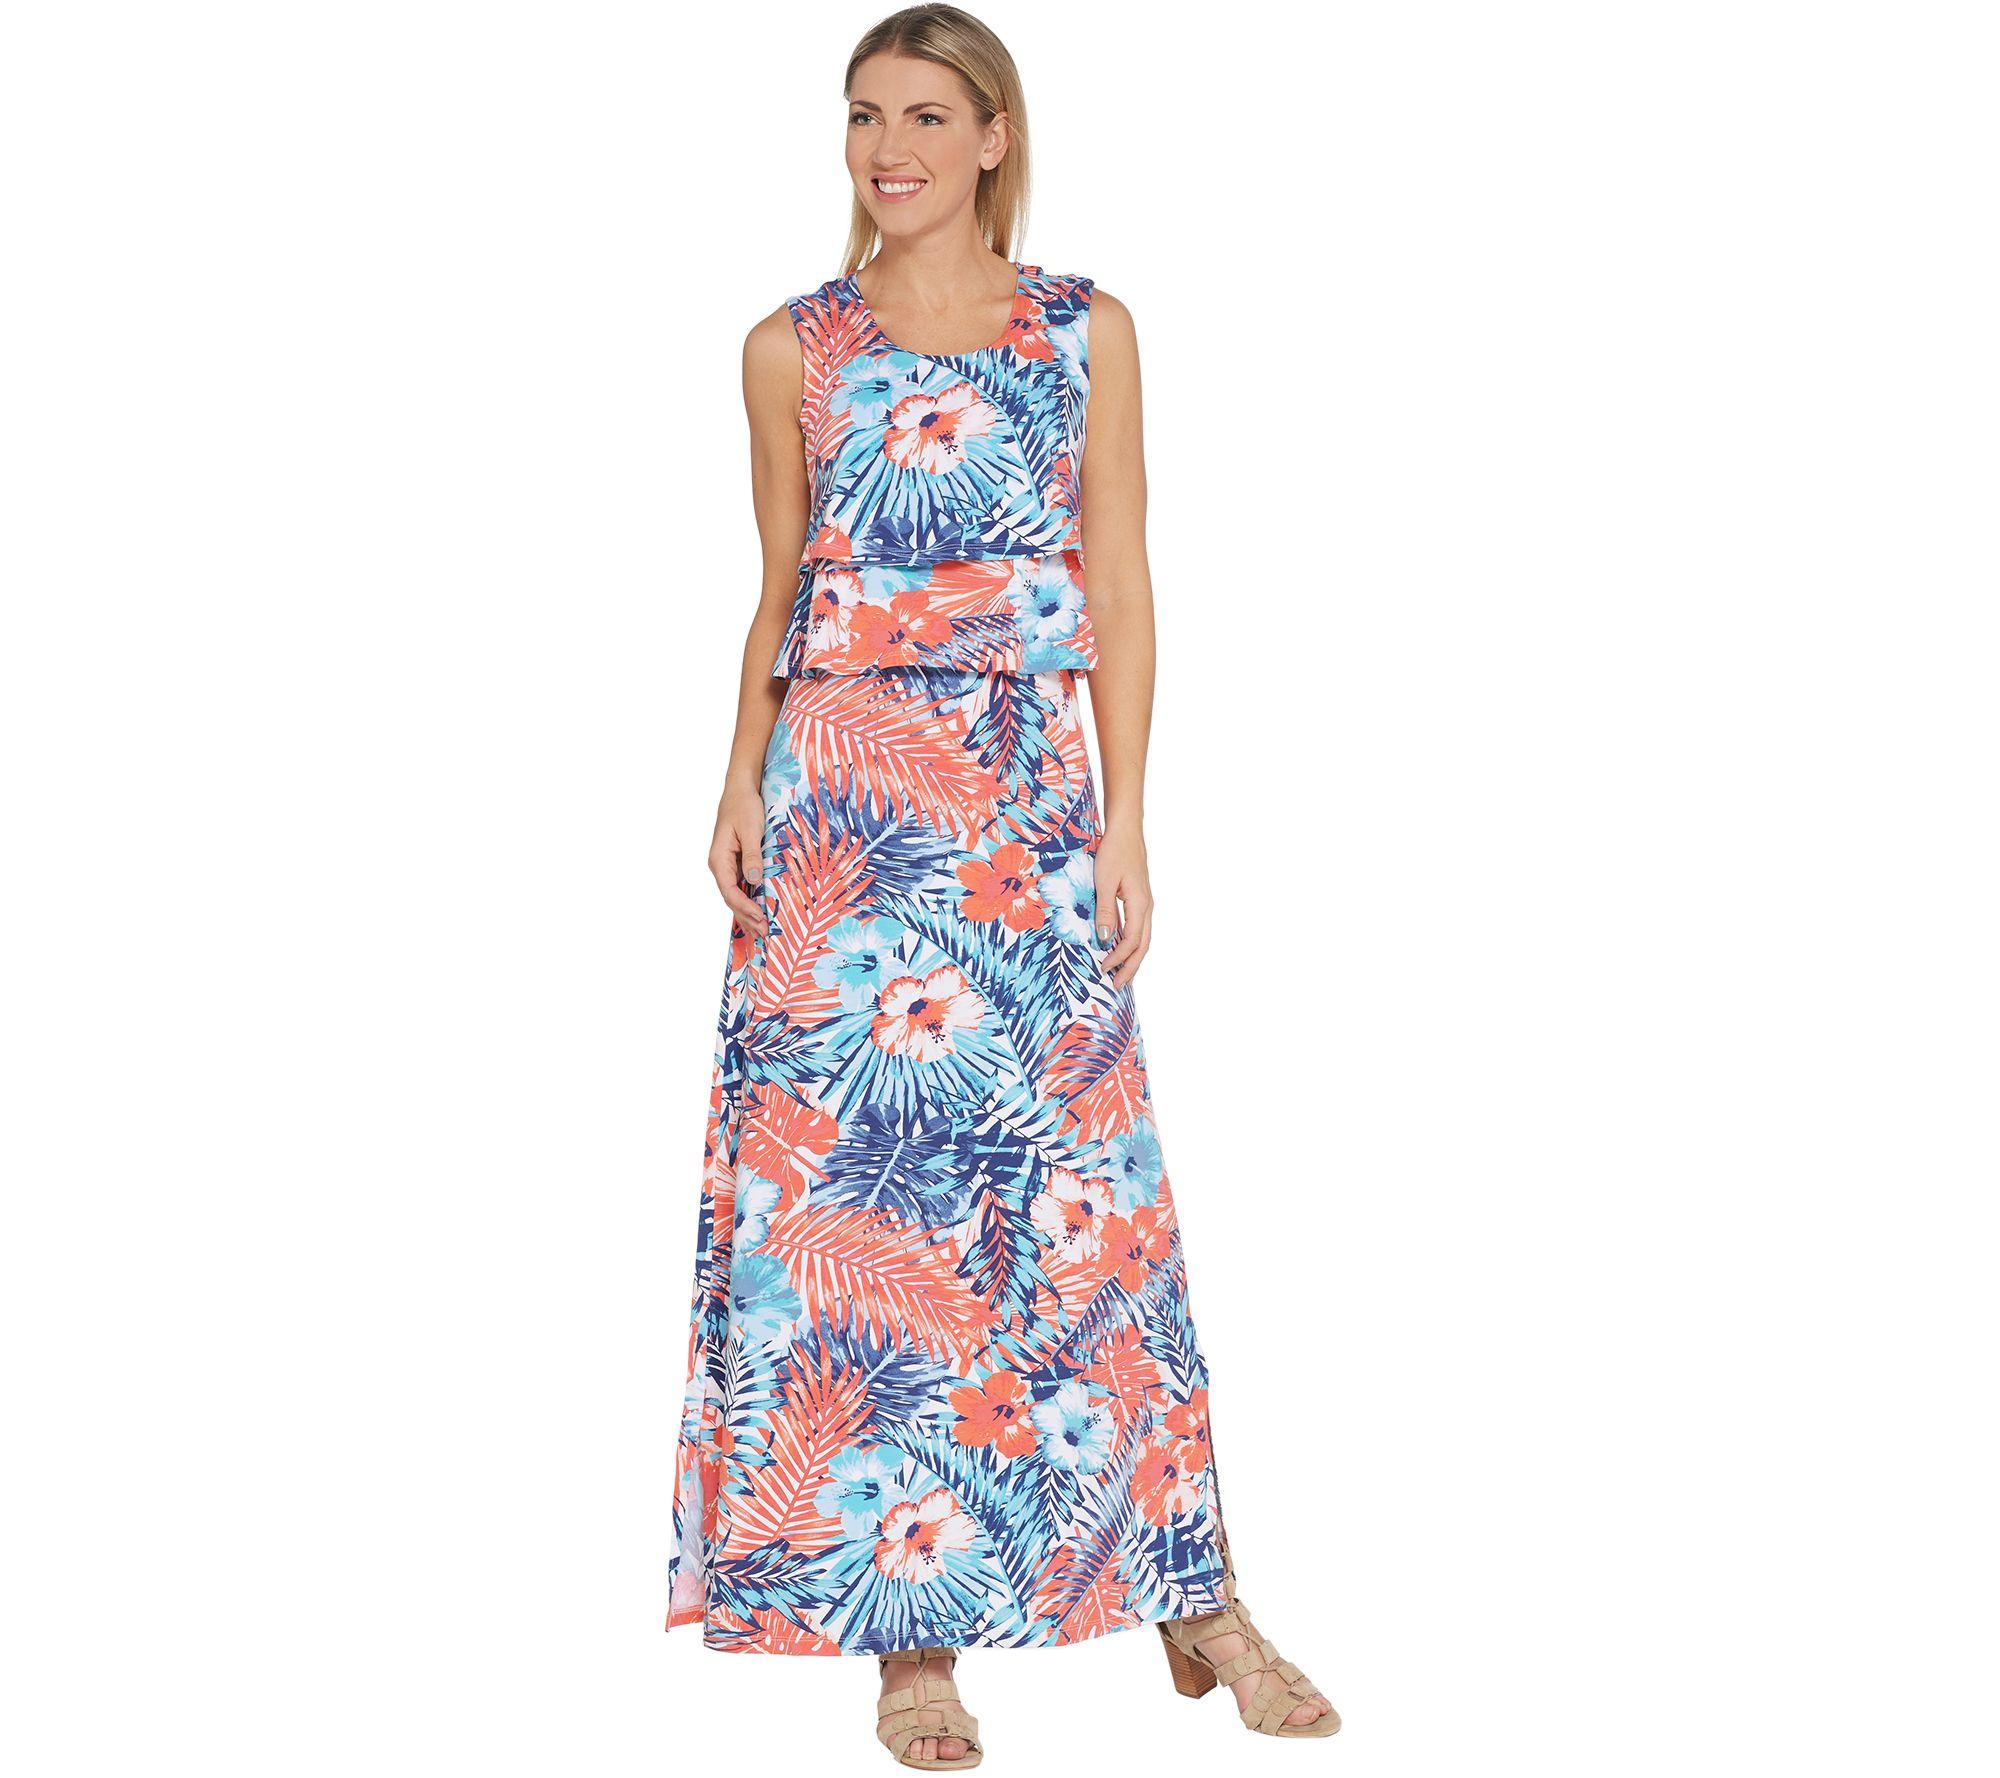 Denim & Co. Regular Floral Printed Sleeveless Knit Maxi Dress - A307040